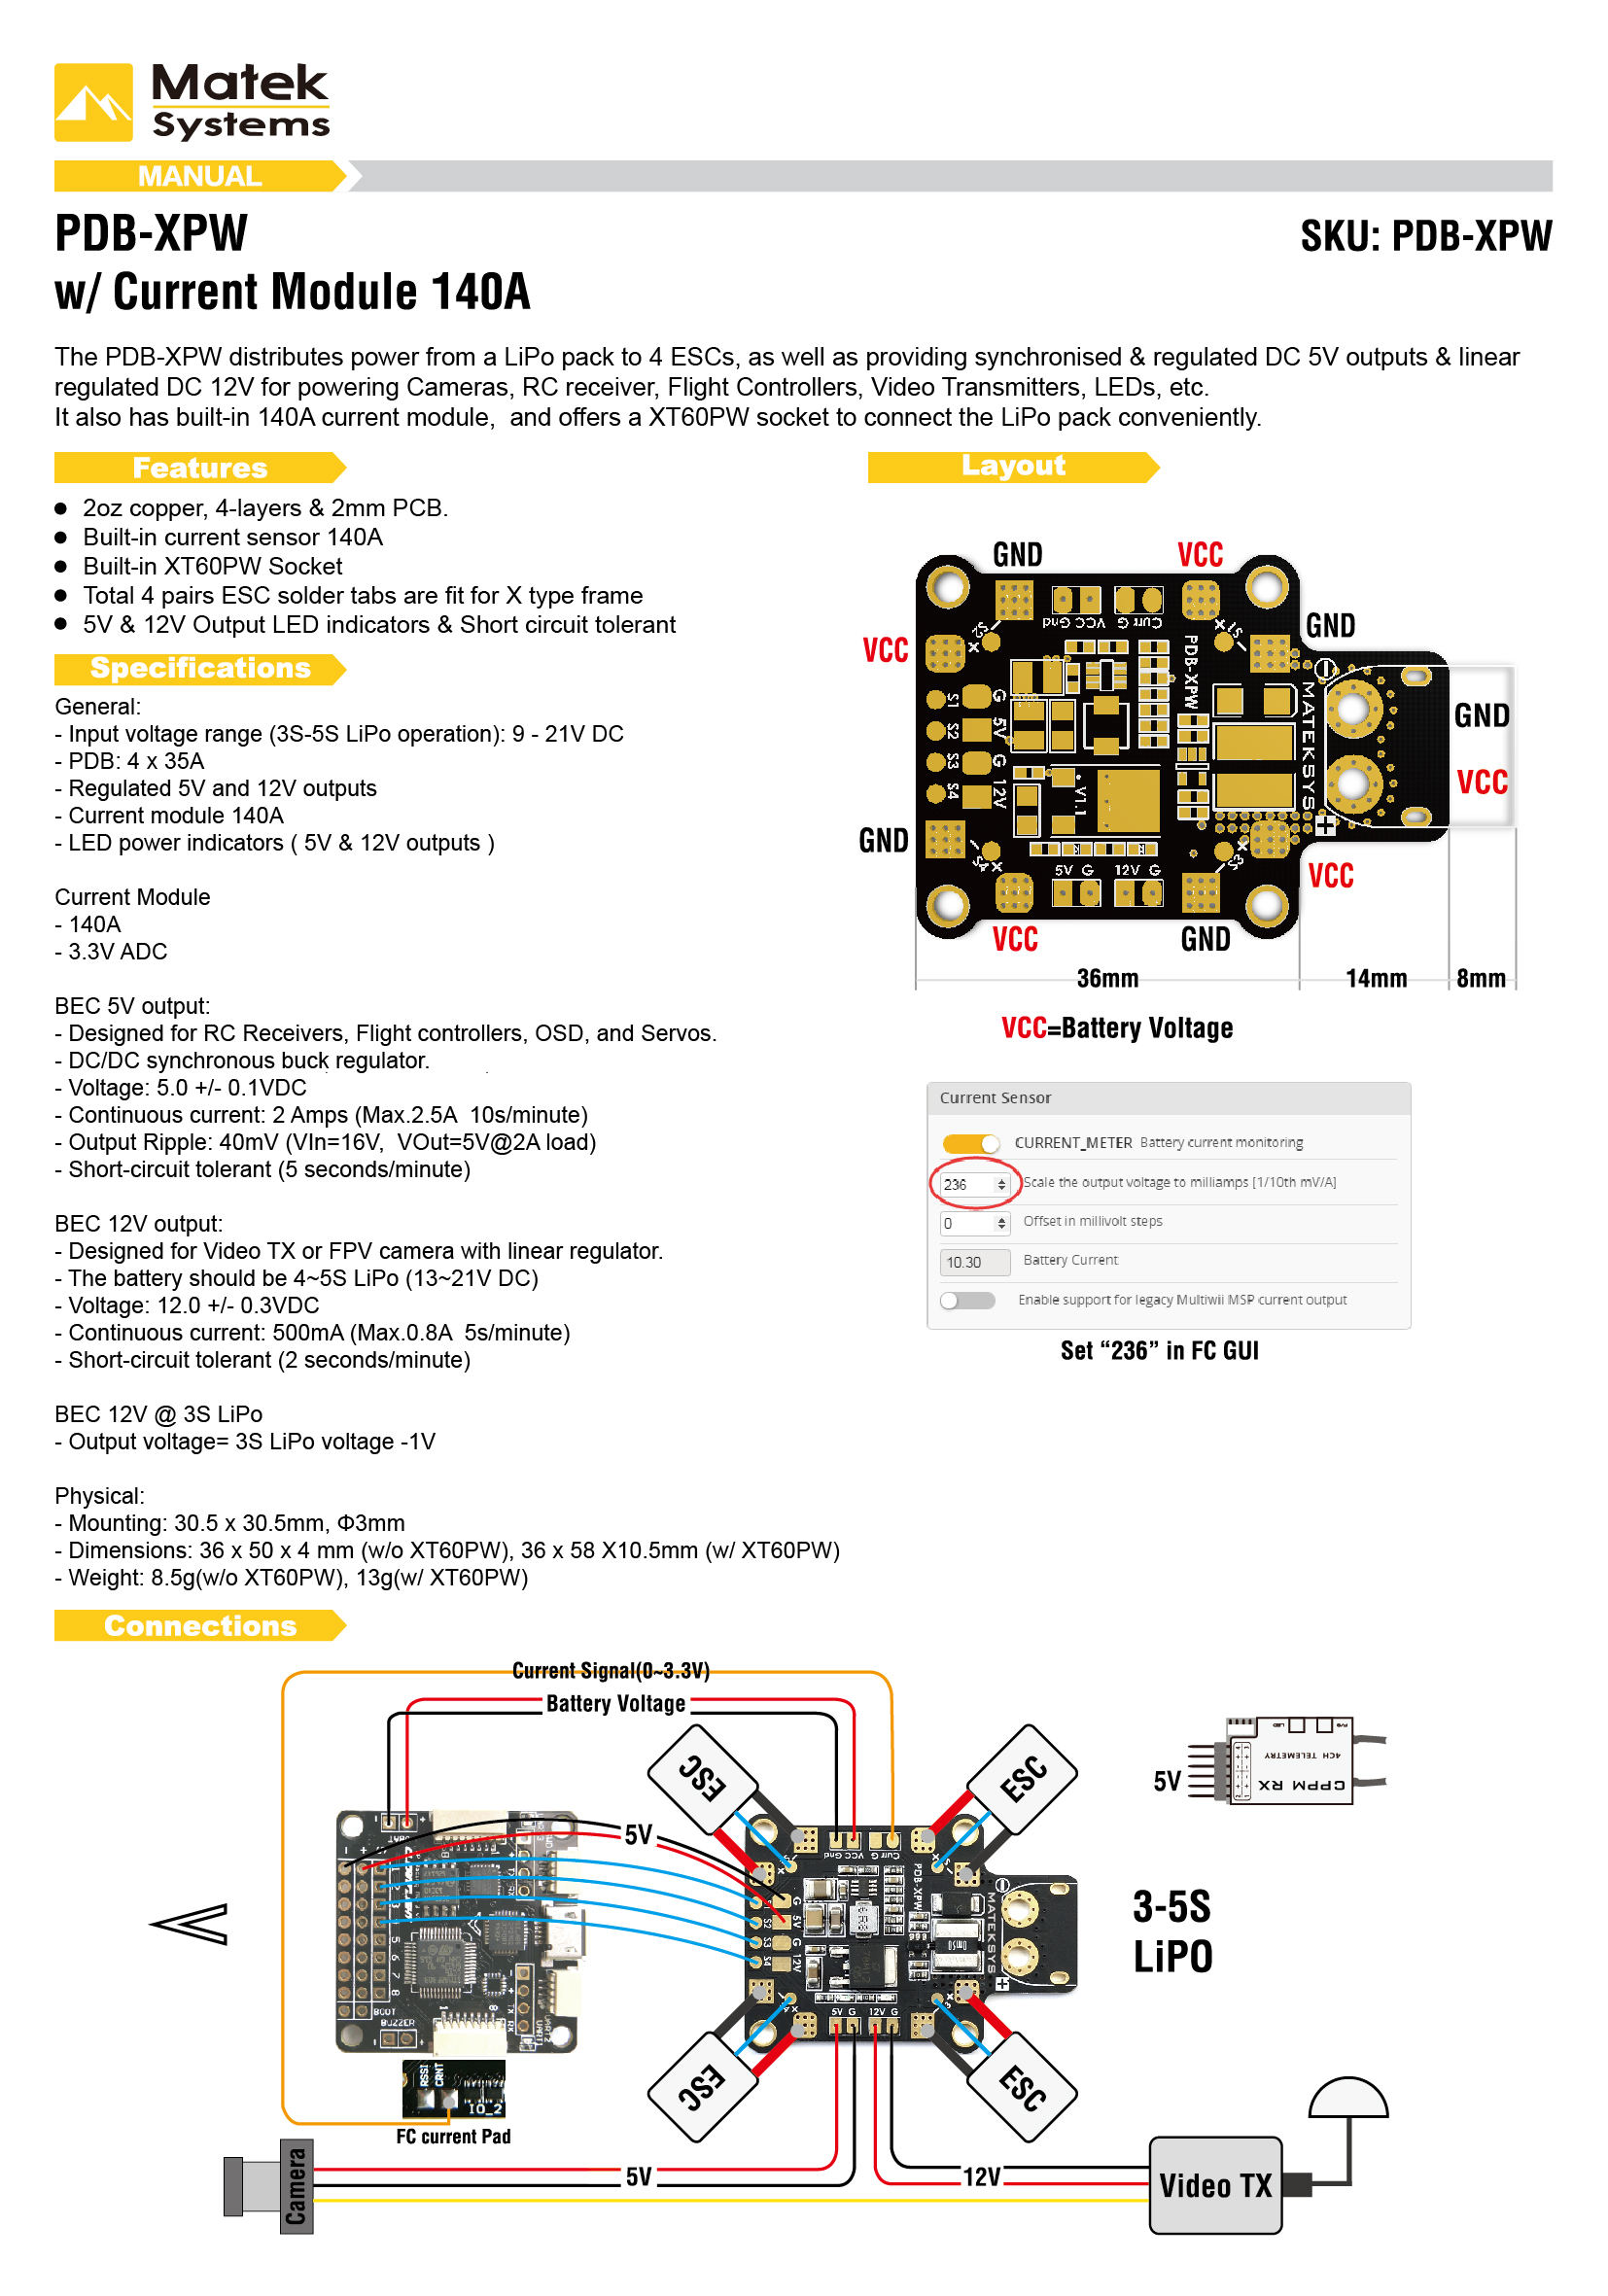 pdb-xpw-manual.jpg